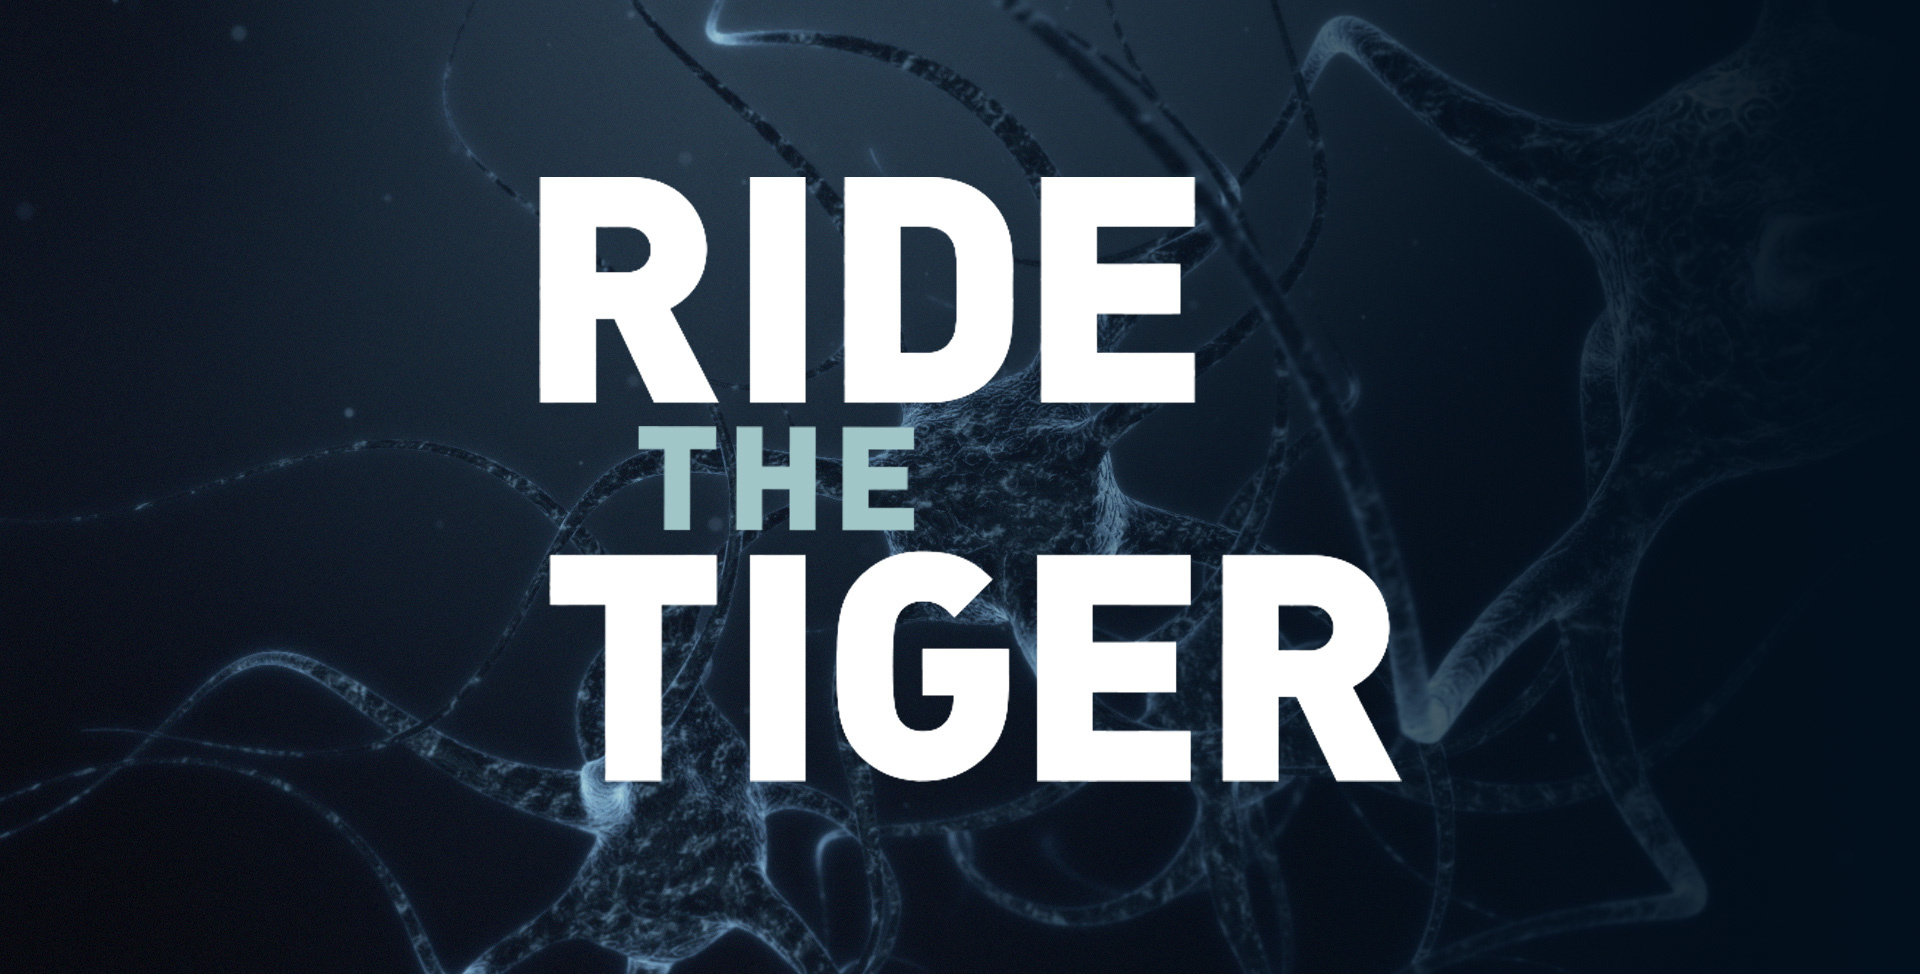 Ride the Tiger – a Guide Through the Bipolar Brain